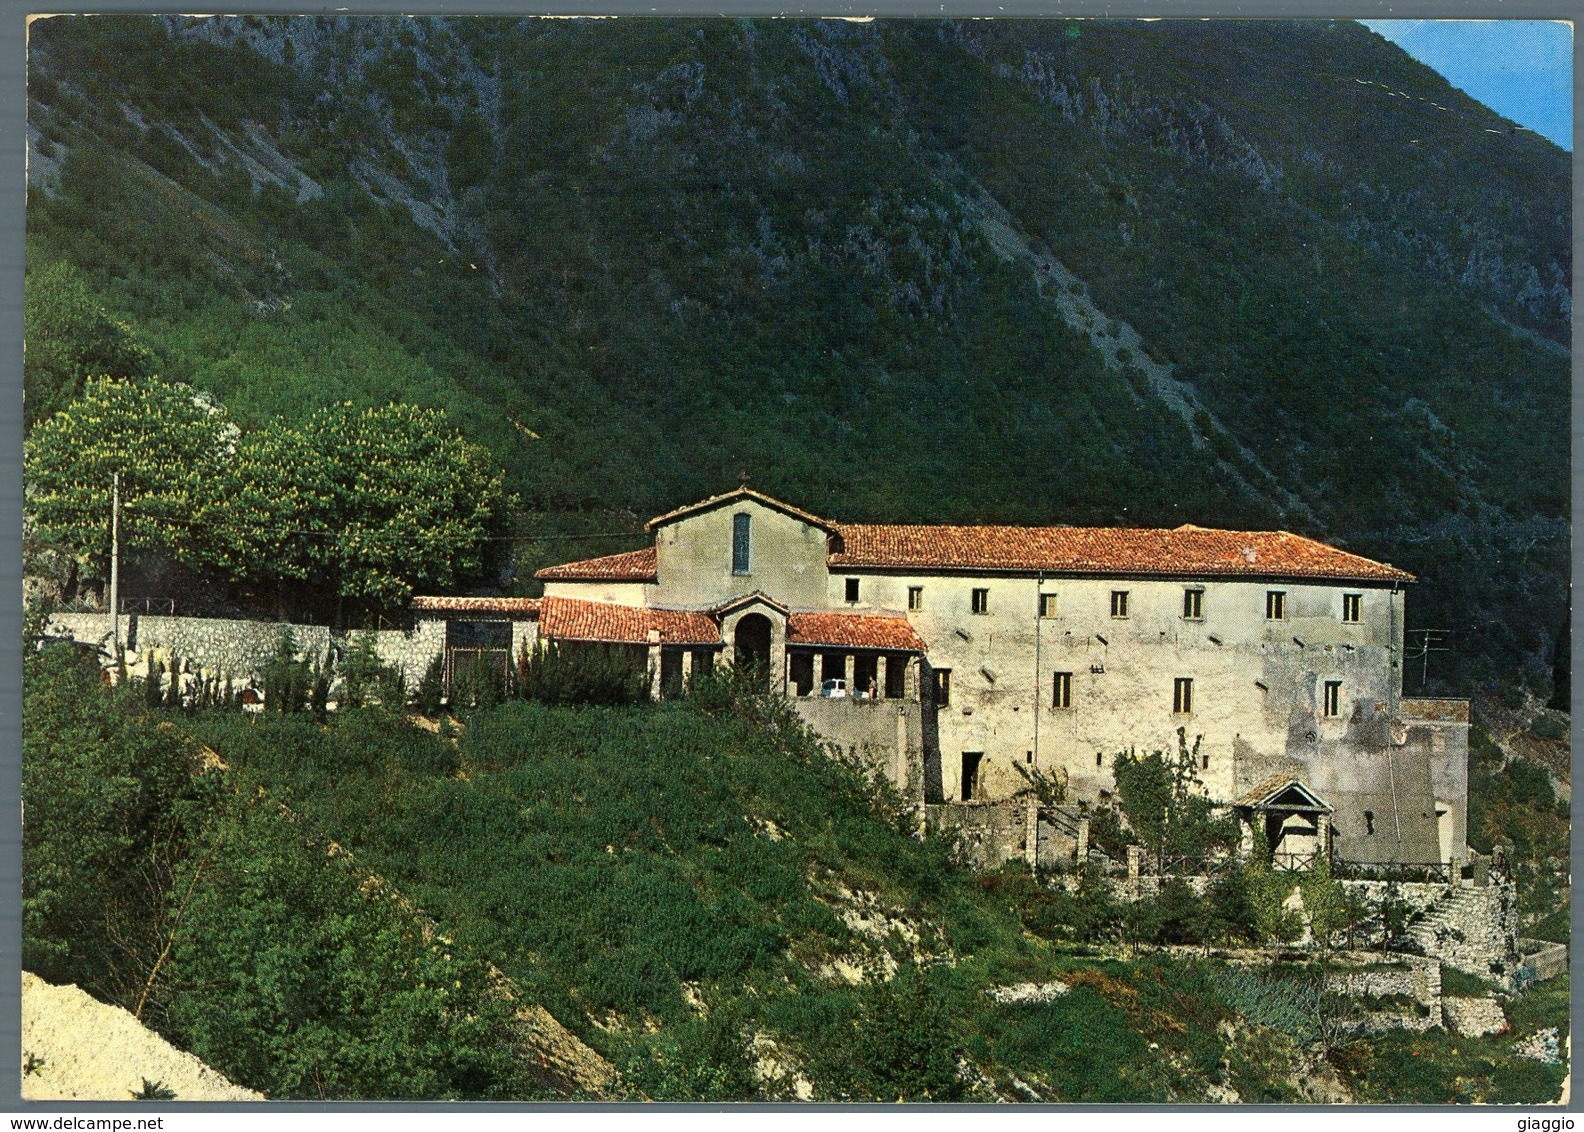 °°° Cartolina N. 36 Poggio Bustone Santuario Francescano Viaggiata °°° - Rieti